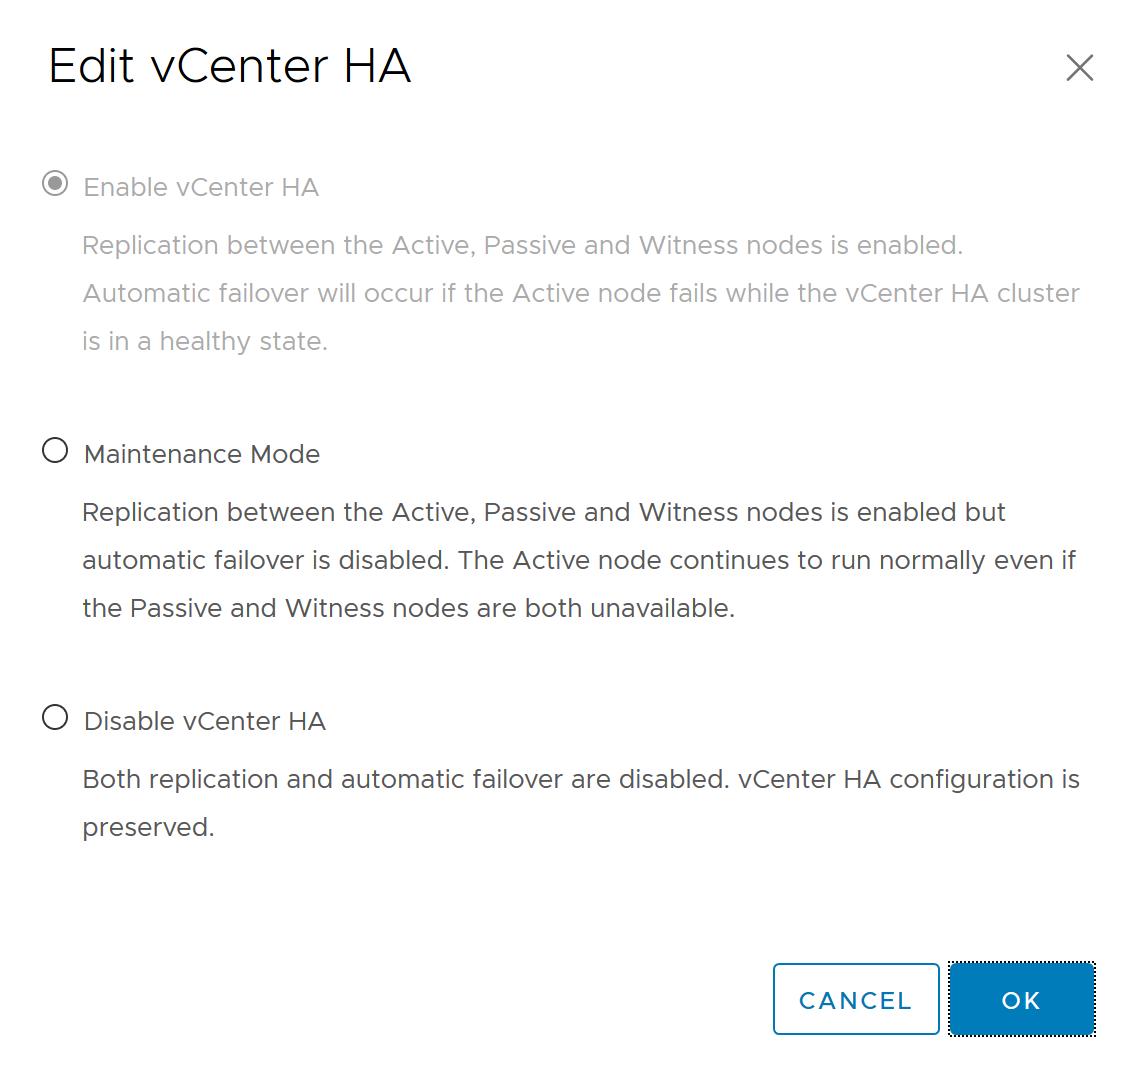 vCenter_HA_Edit